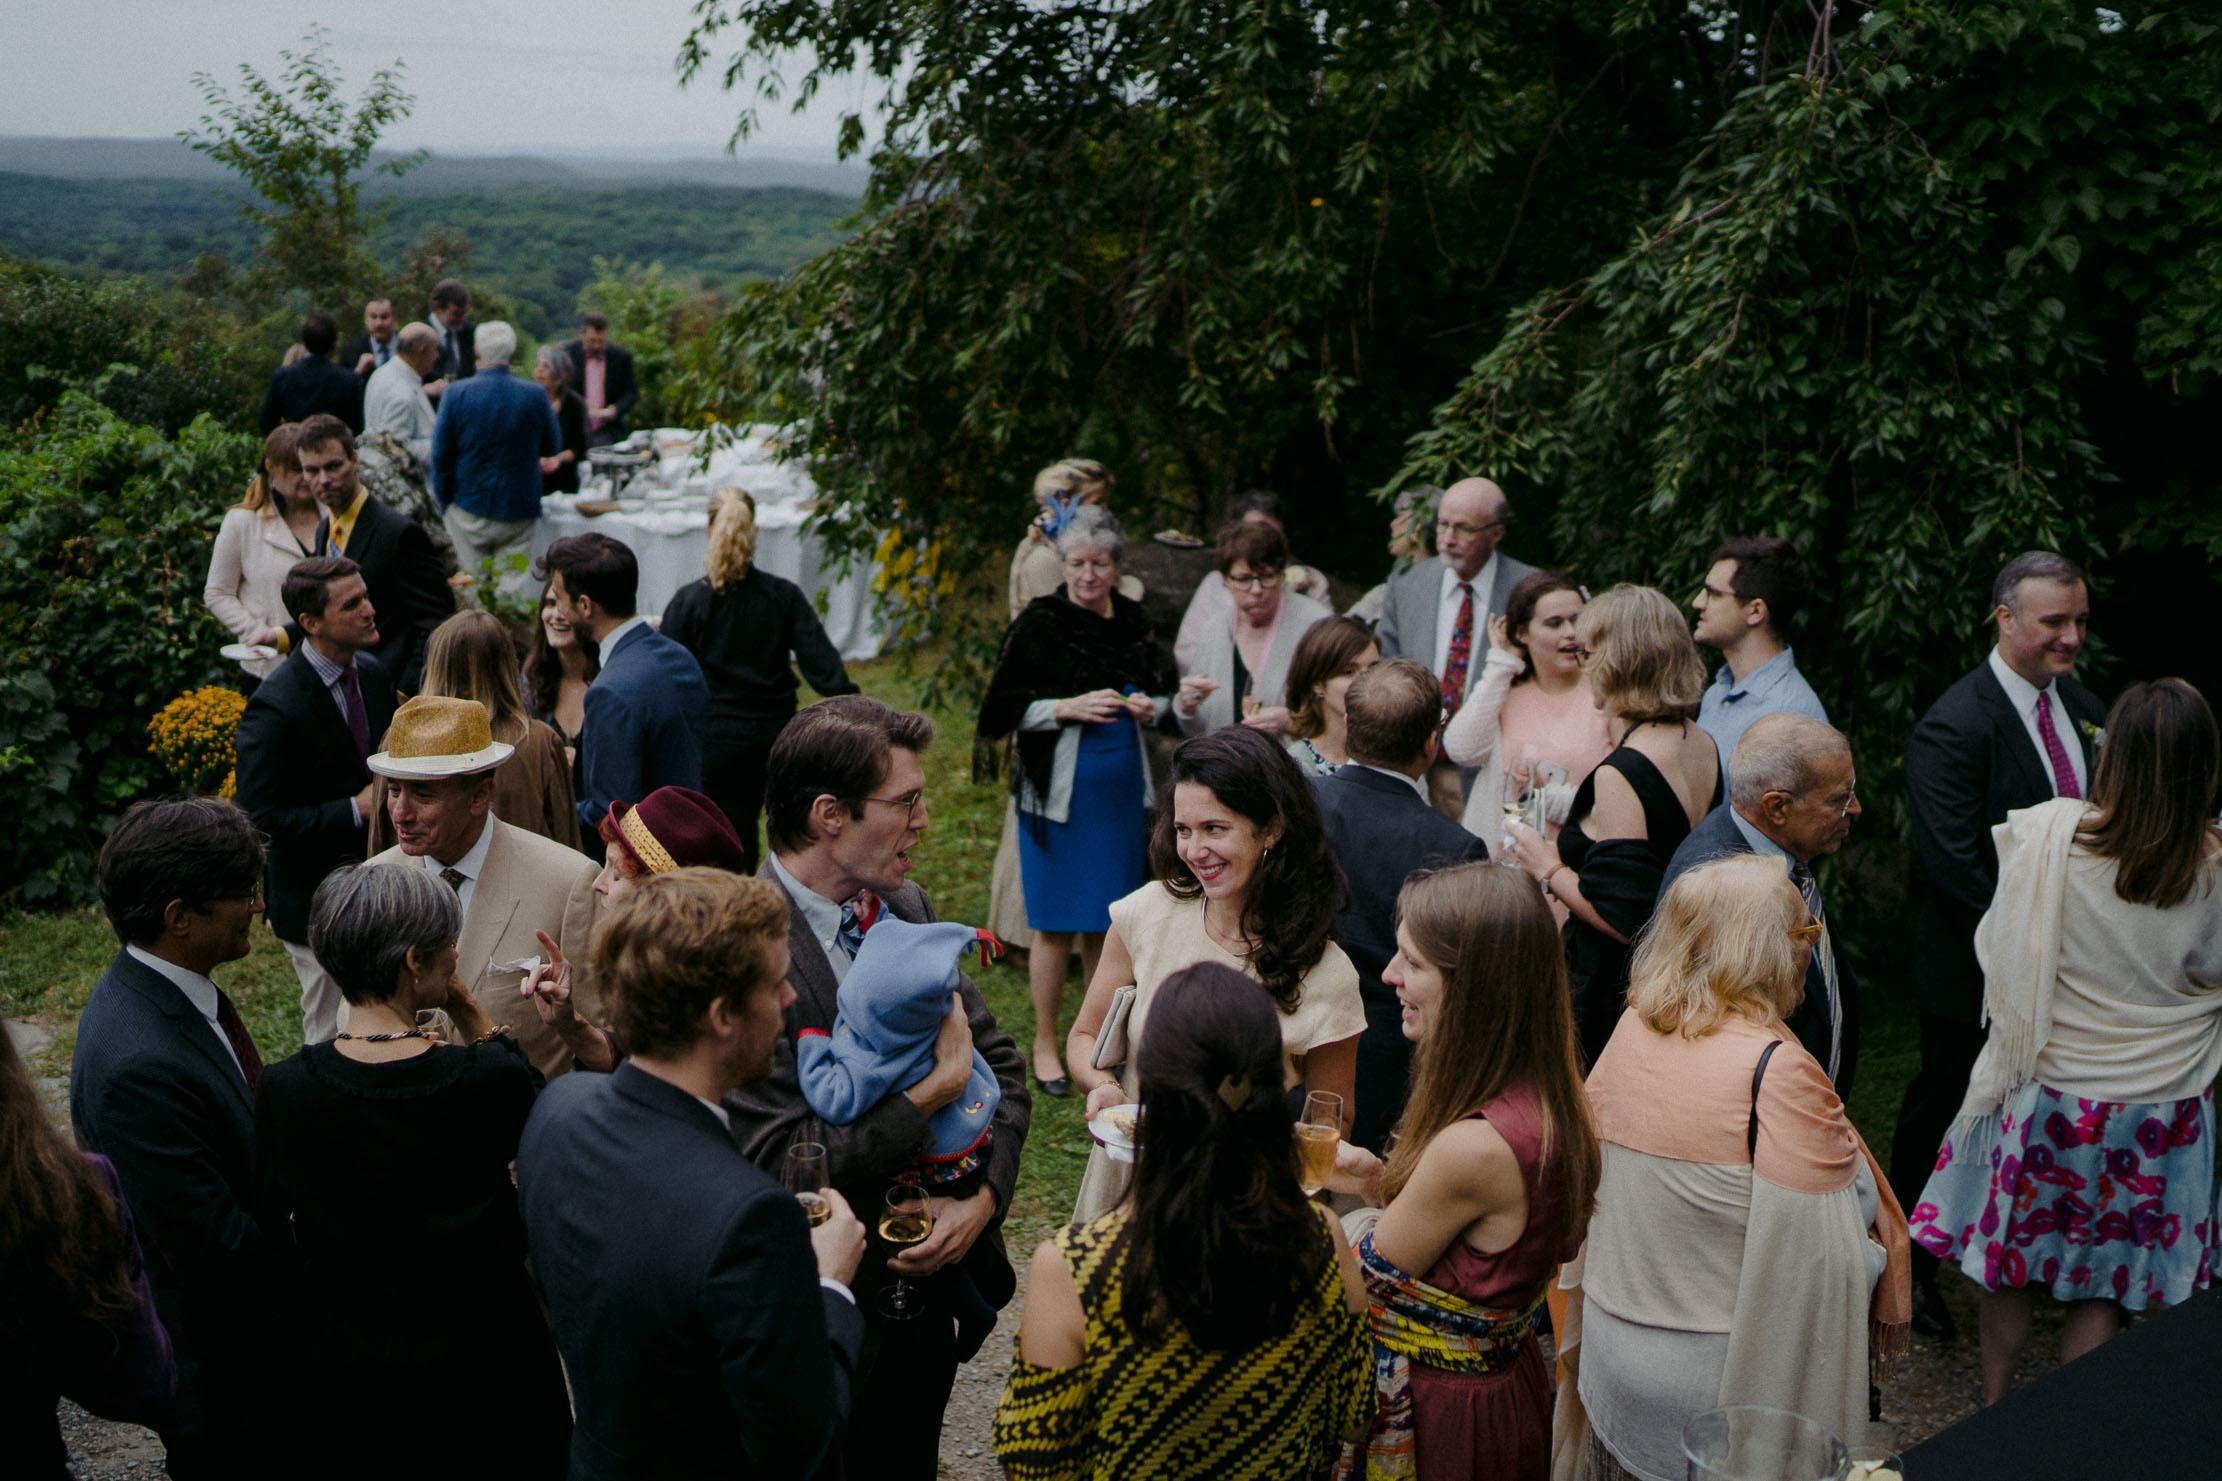 Wings-Castle-Millbrook-NY-Upstate-Wedding-Photographer-1110.jpg